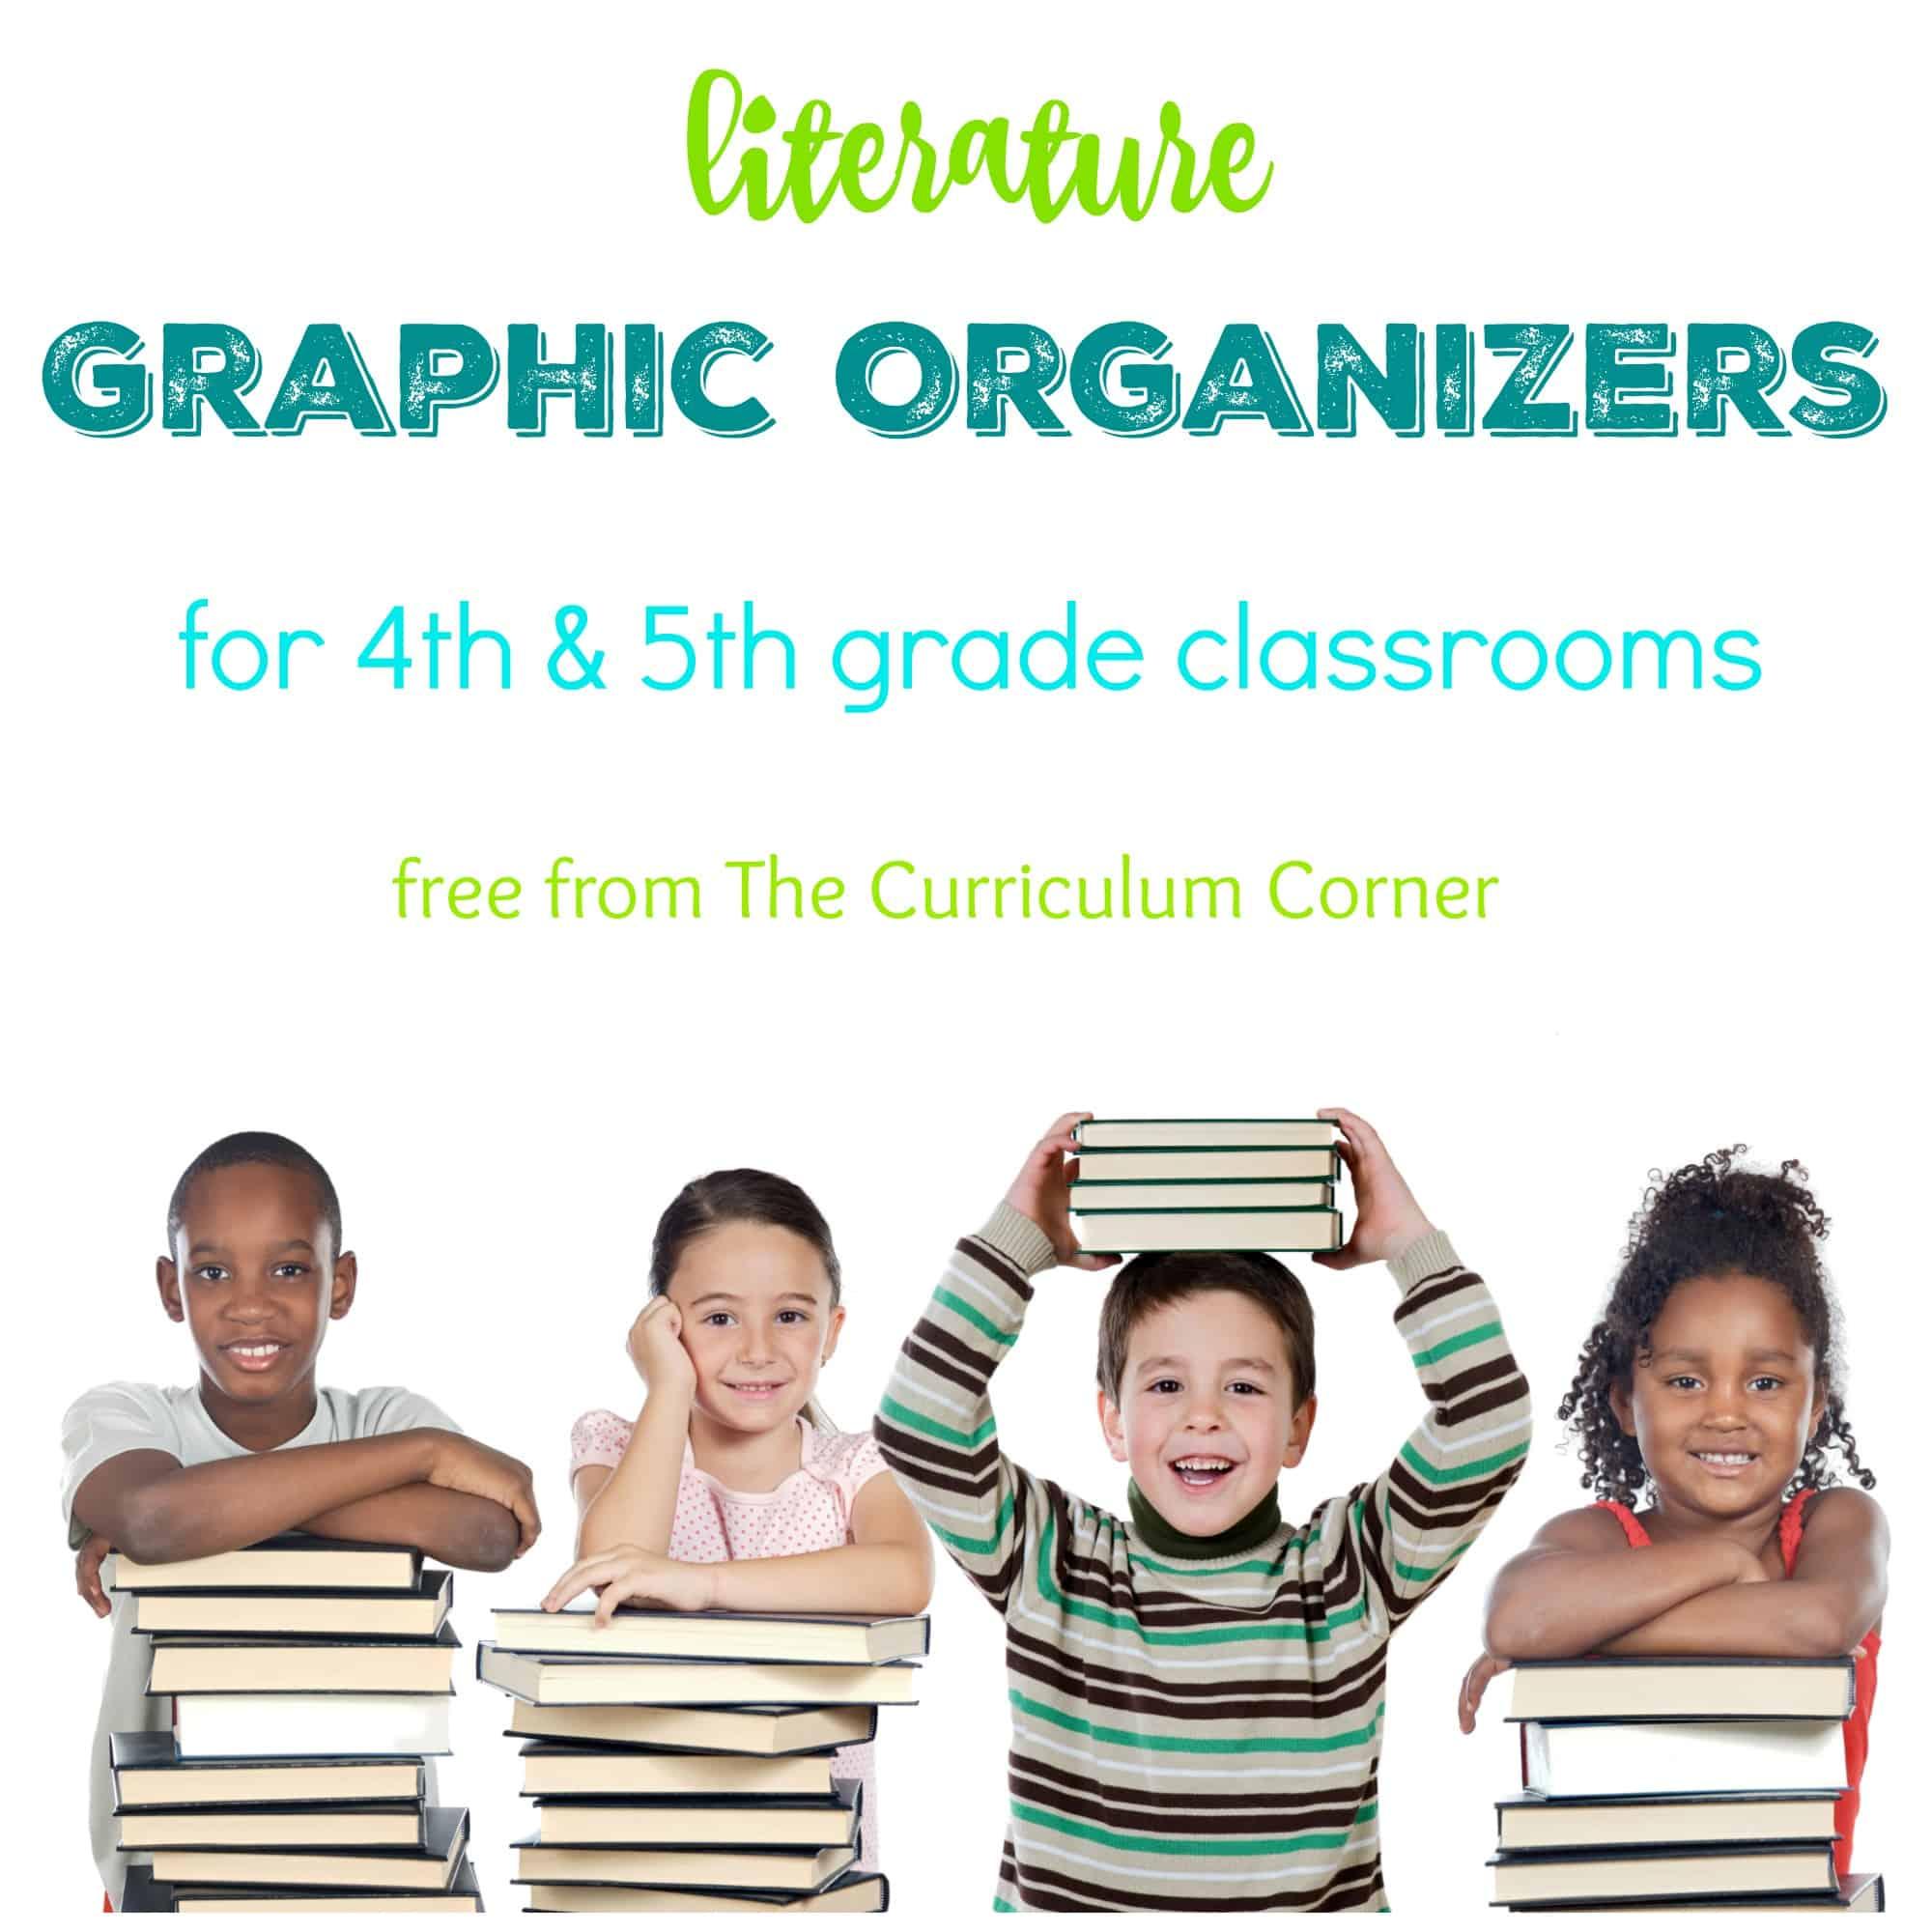 Literature Graphic Organizers